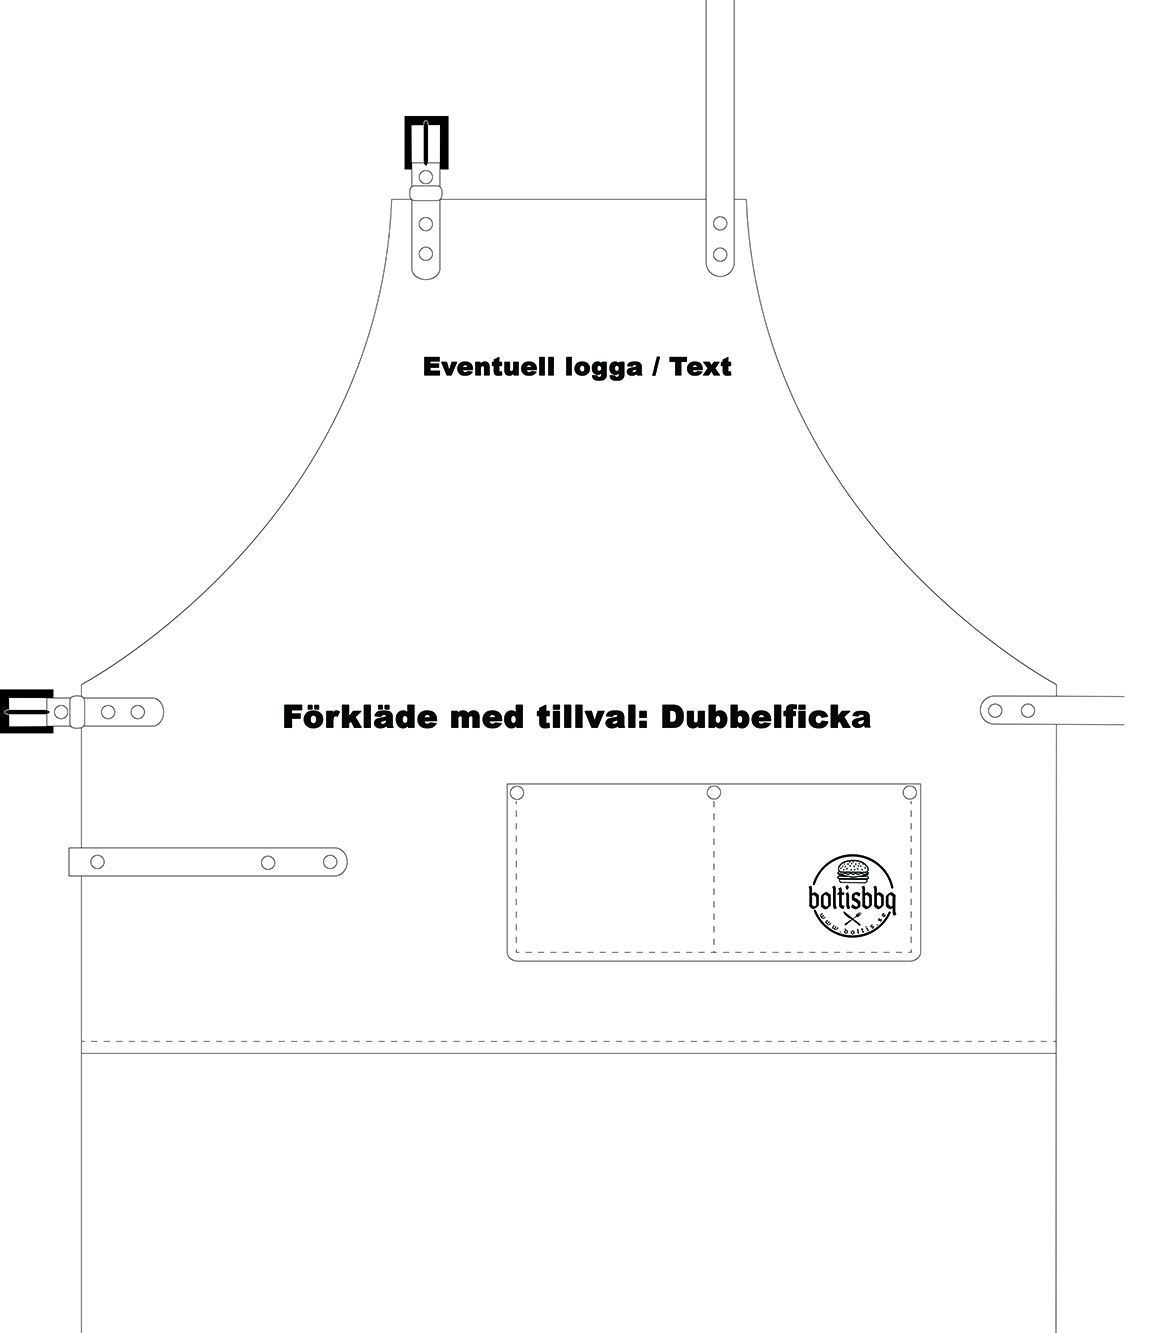 Boltisbbq layout